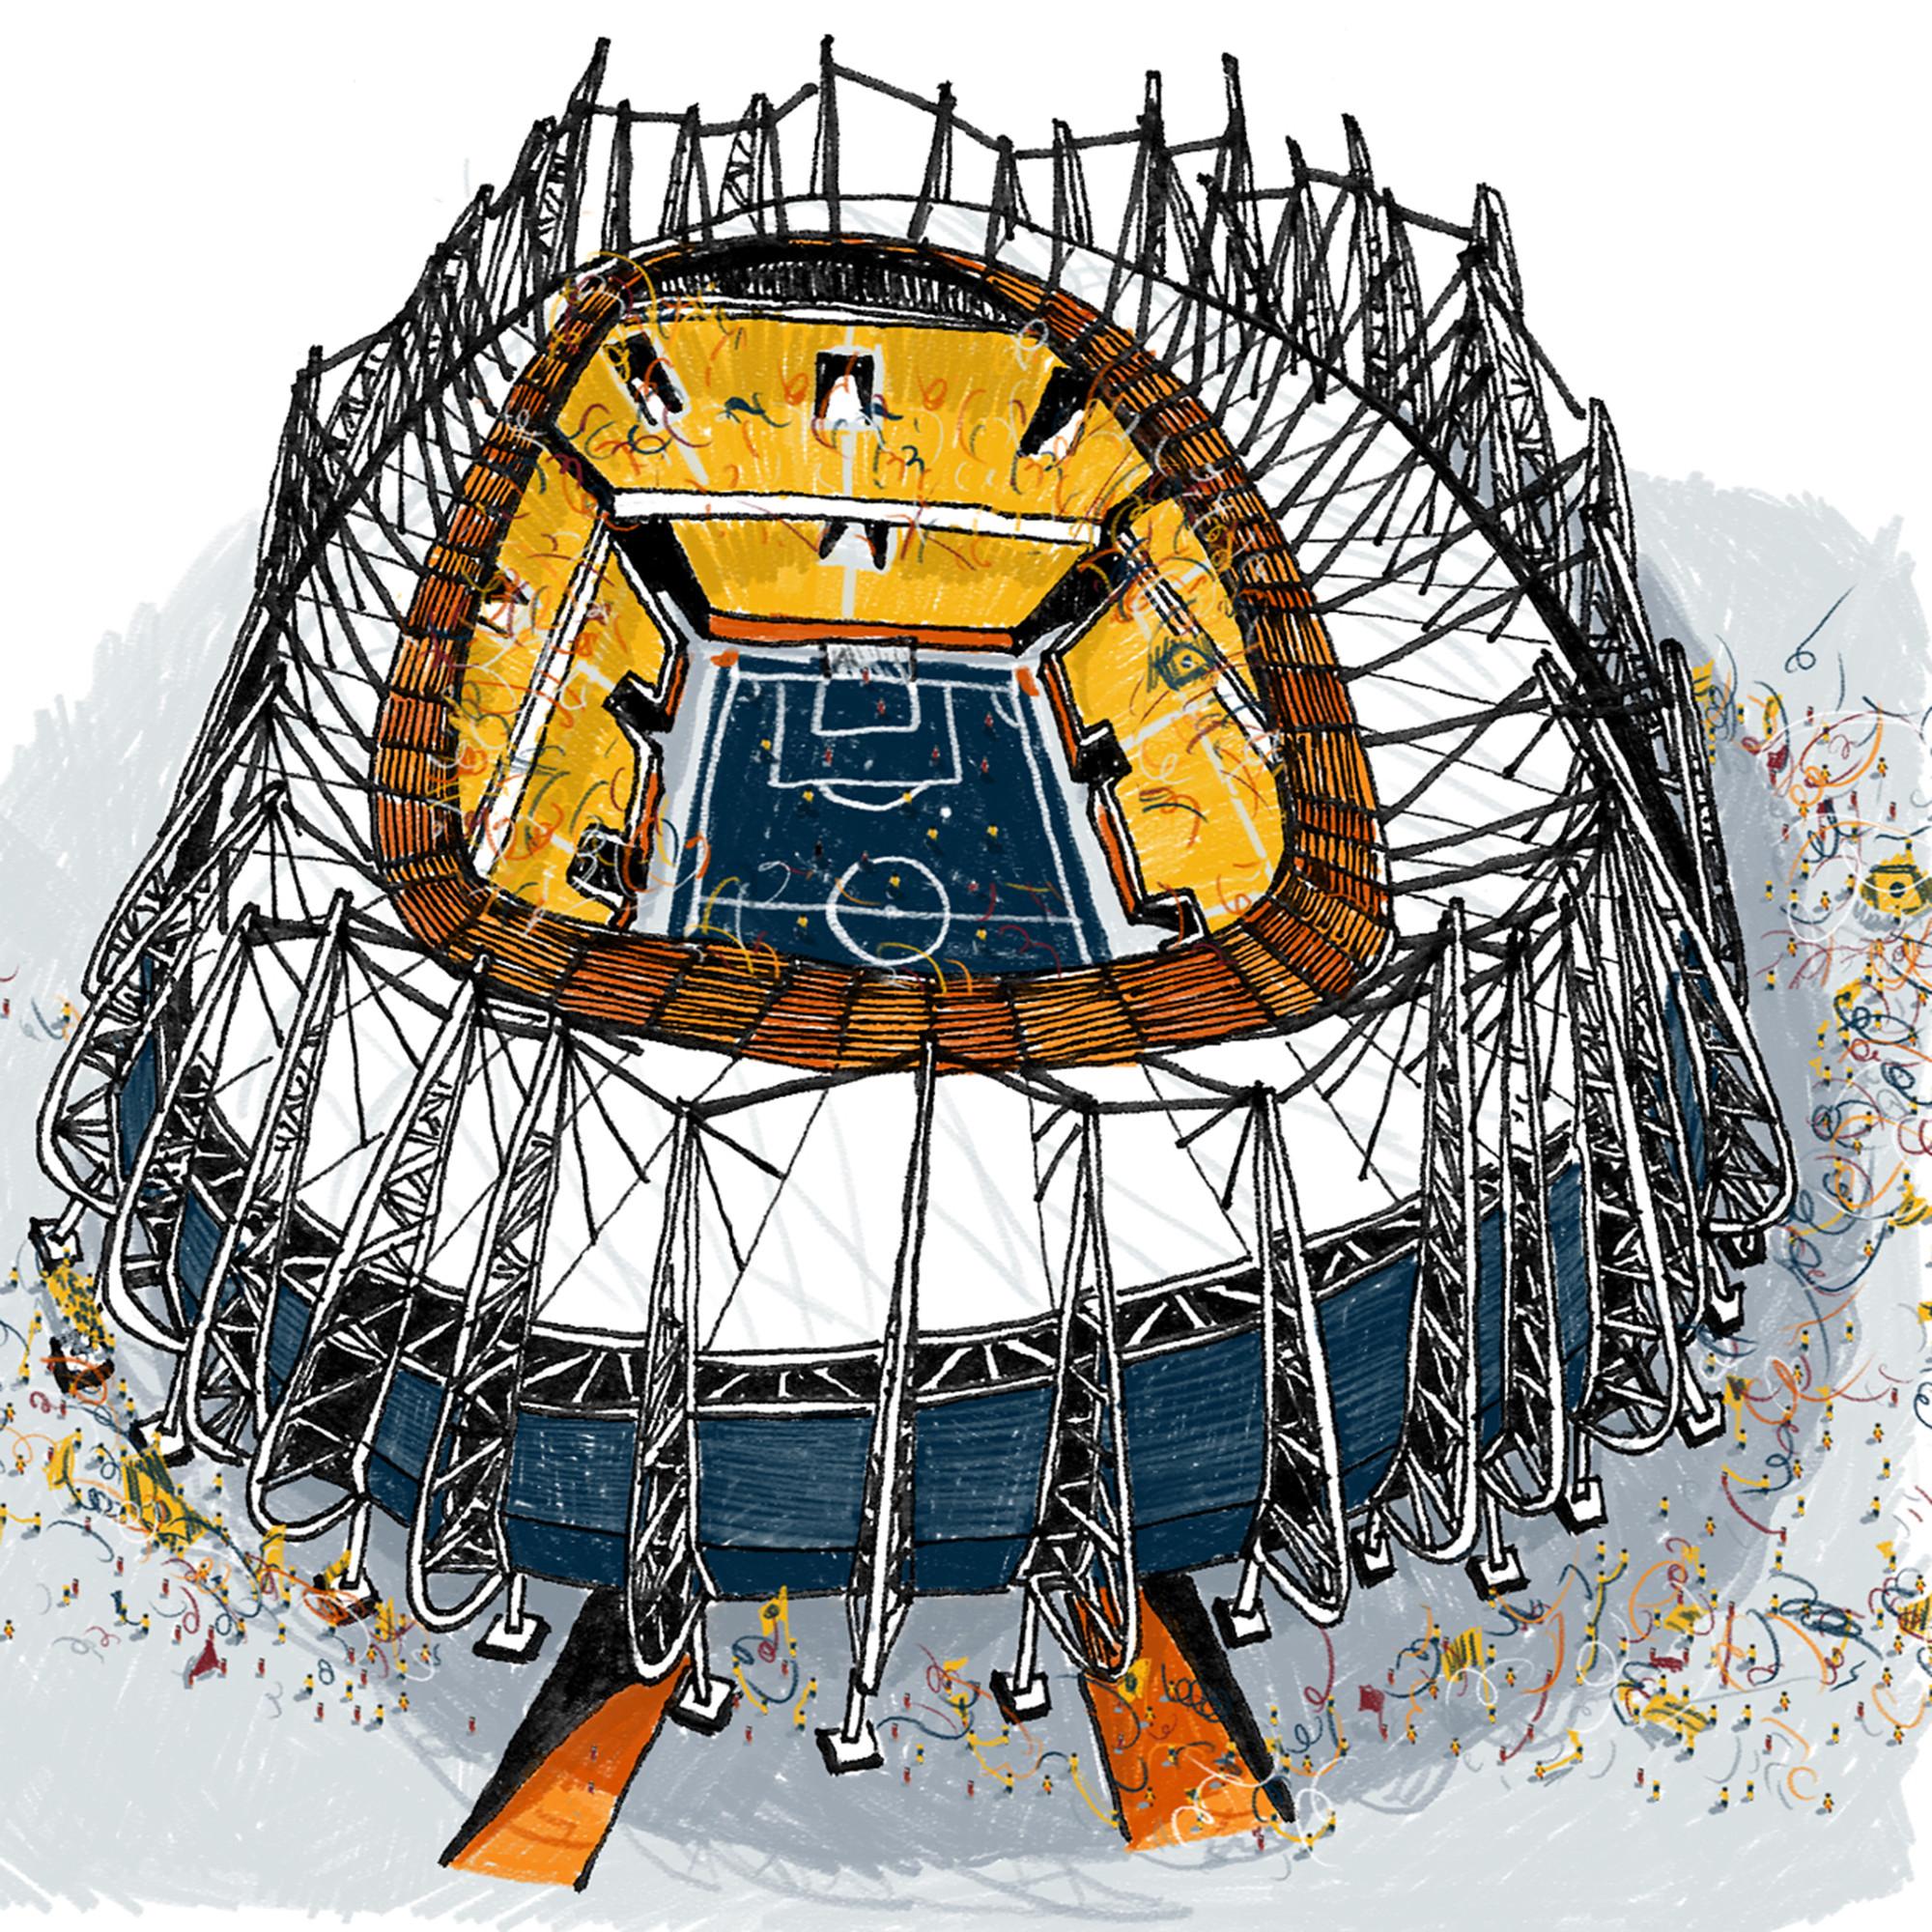 Estádios da Copa ilustrados pelo estúdio Vapor 324